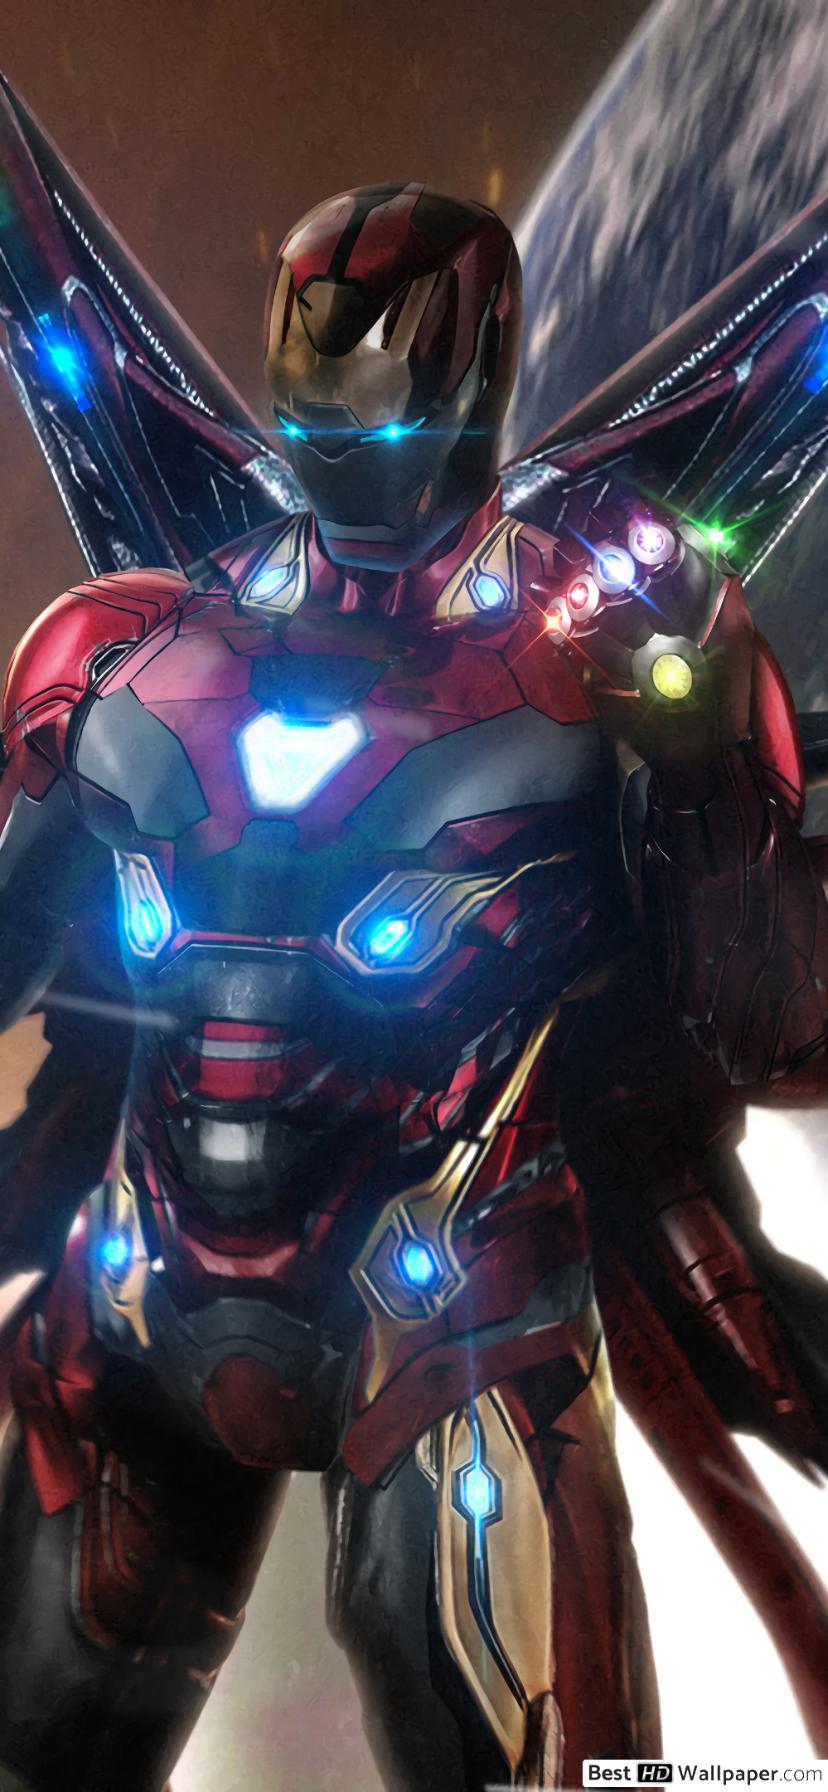 Iron Man Wallpaper 4k For Mobile - HD Wallpaper